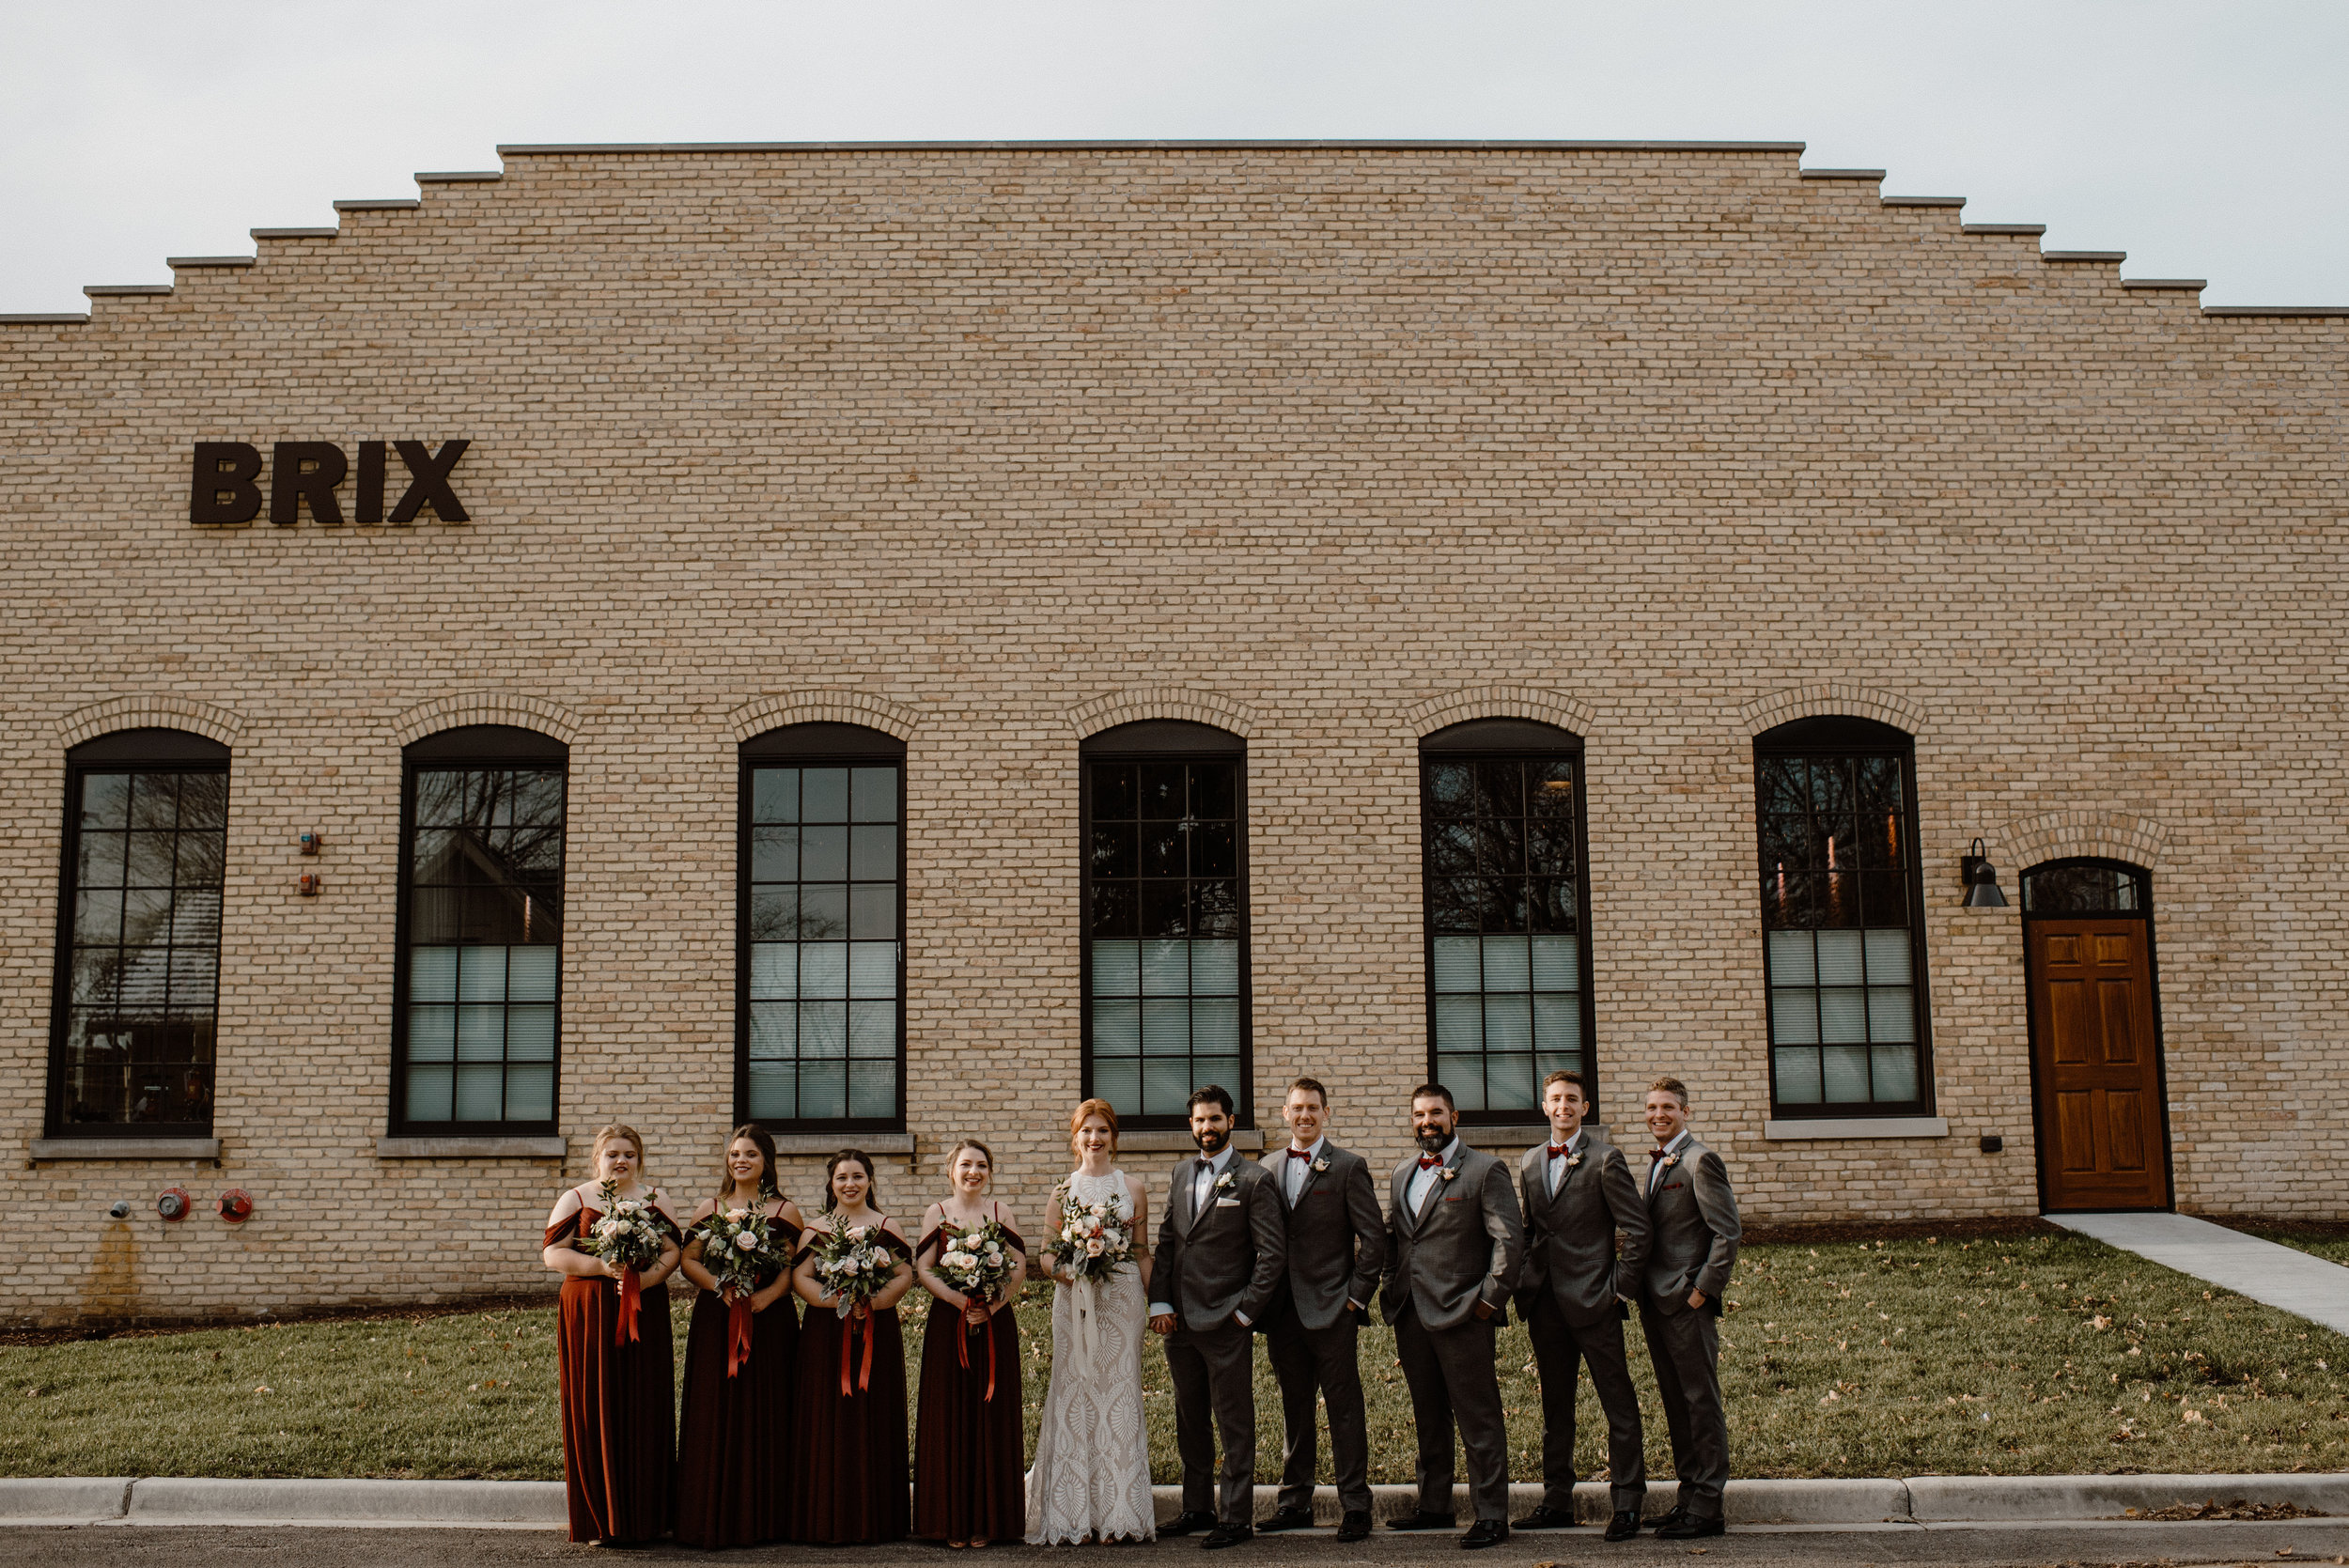 The Brix on Fox, Chicago Wedding Photographer, Zach and Rosalie00042.jpg